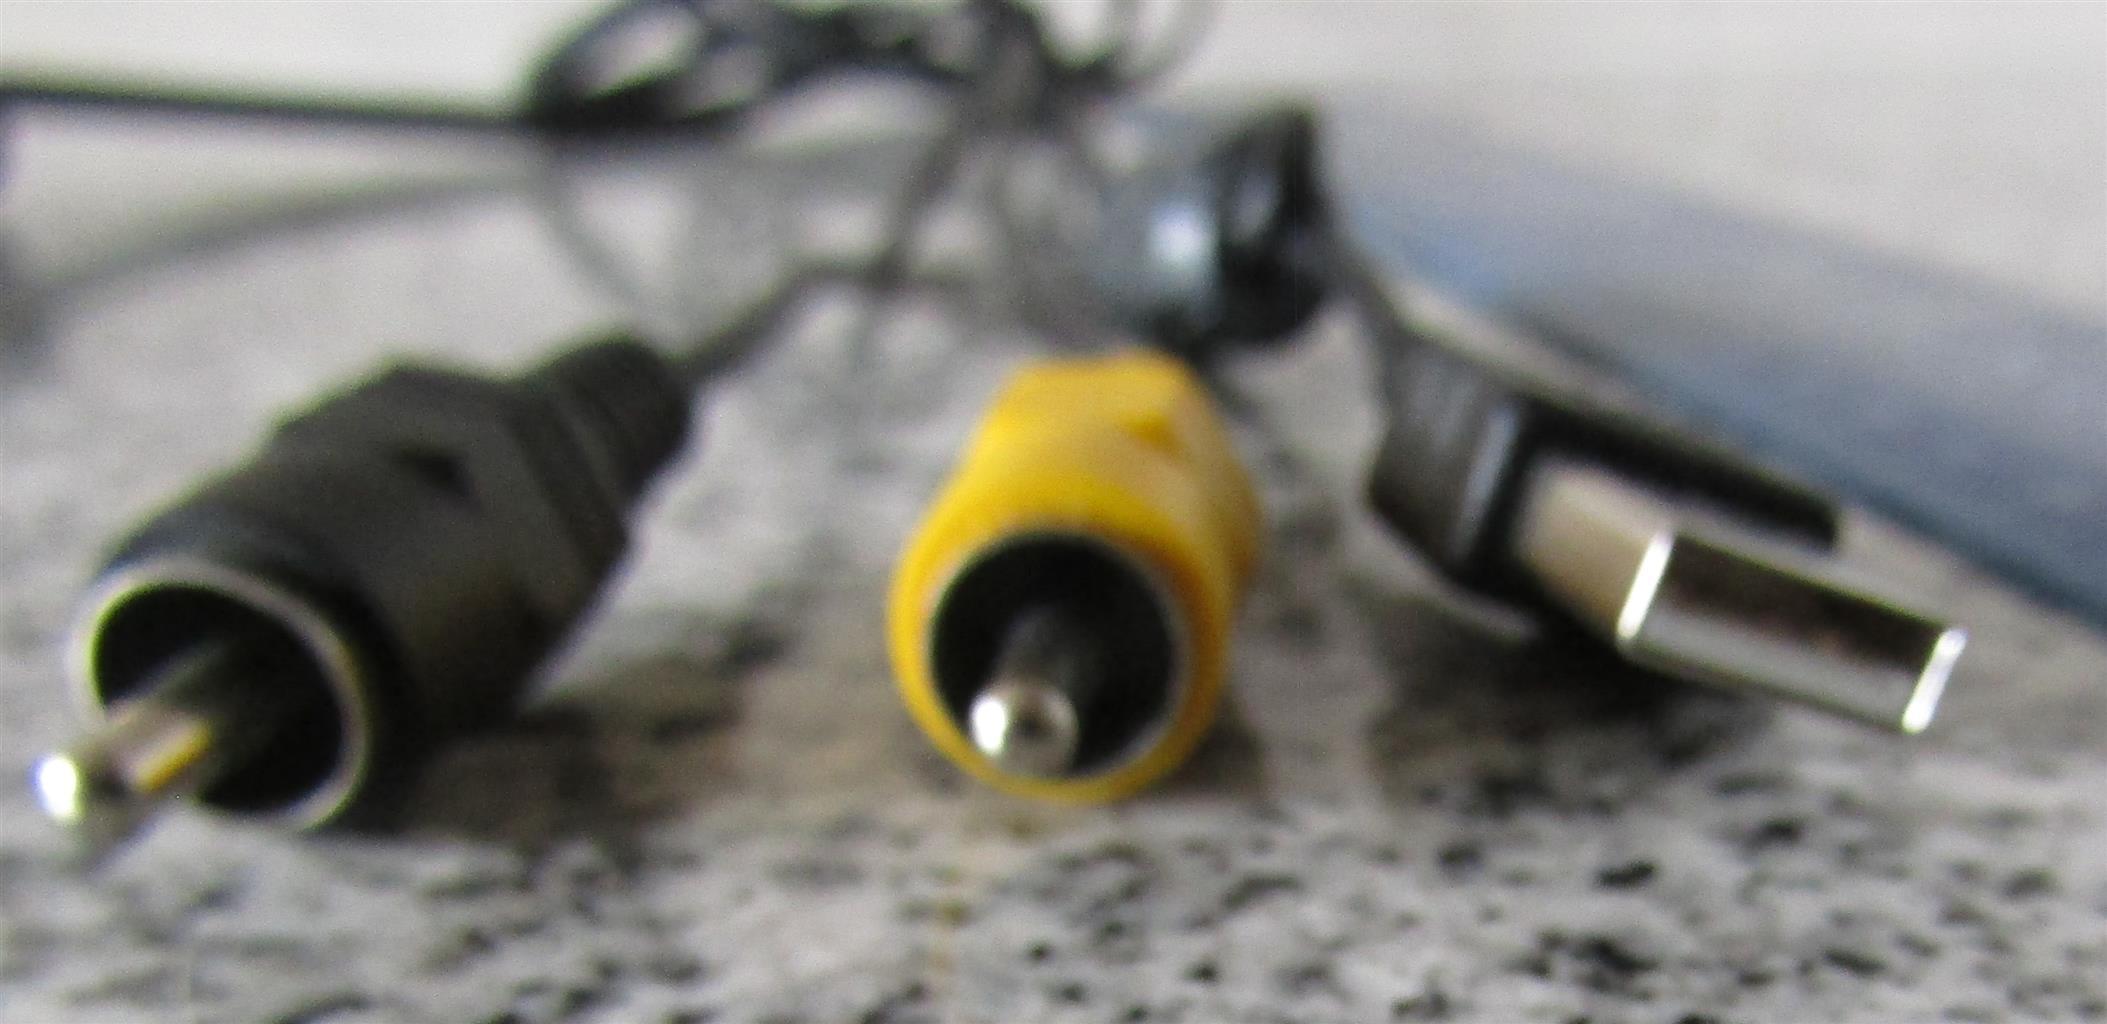 Sony AV Cable